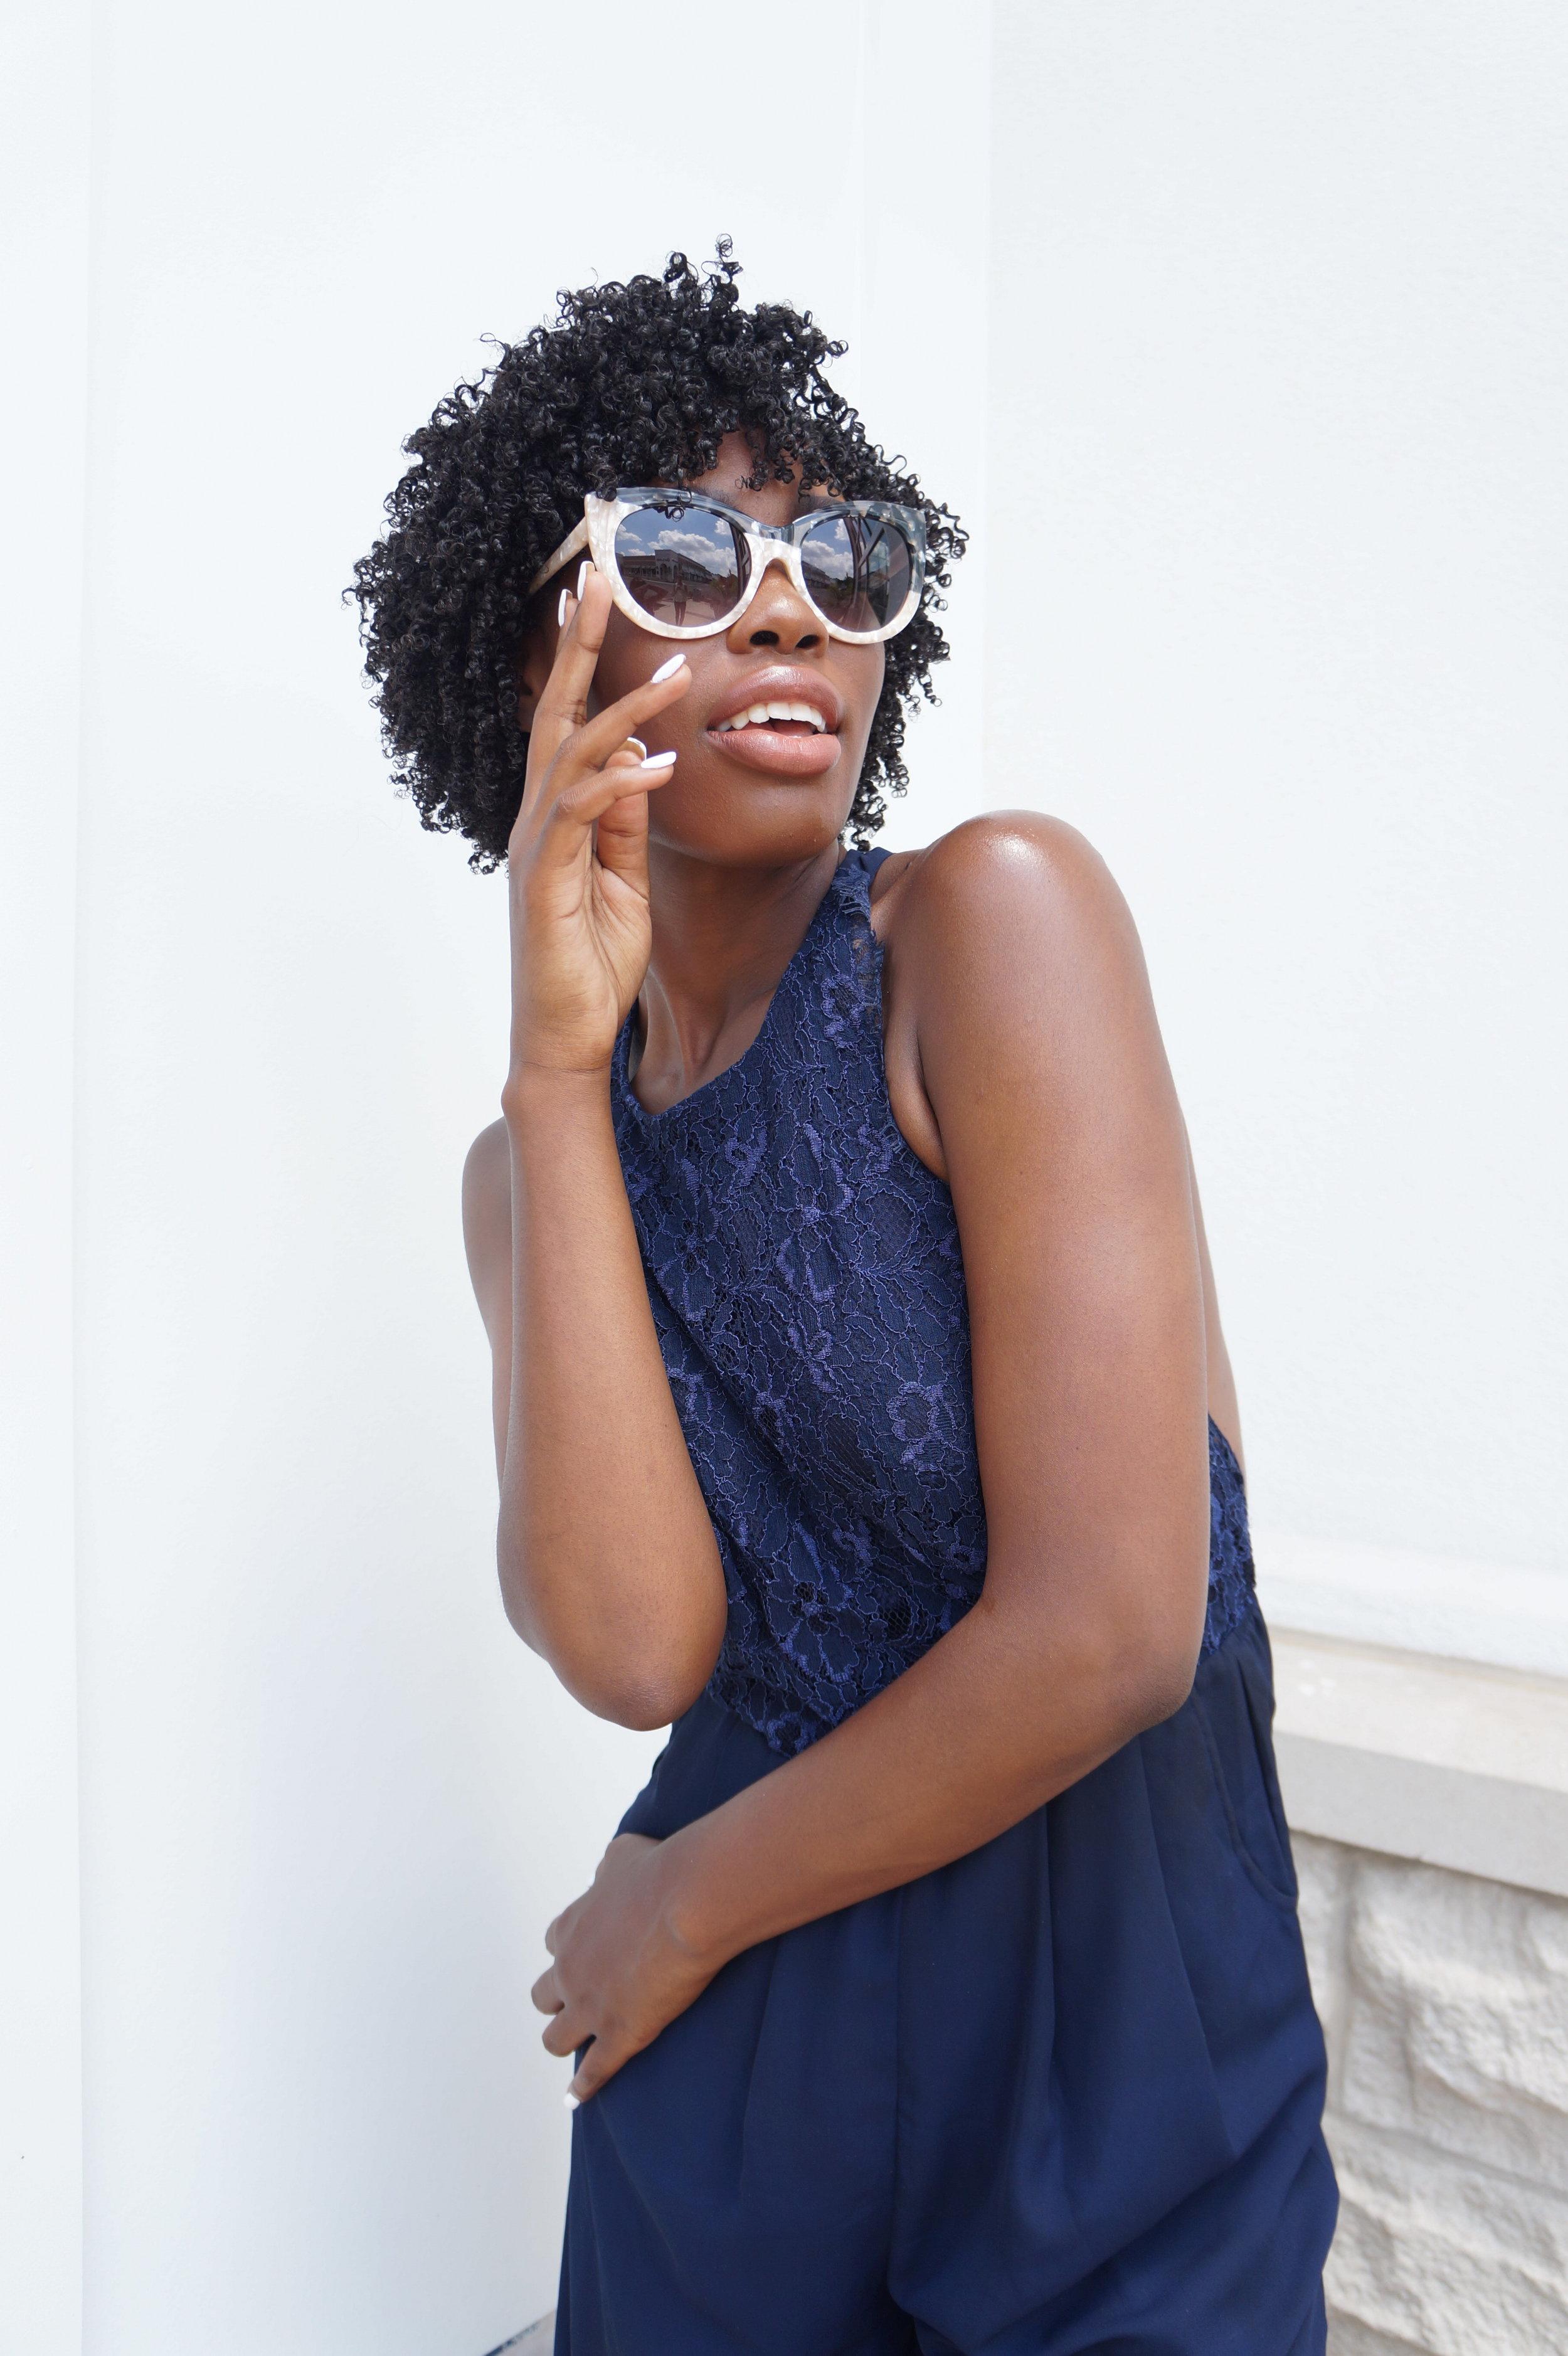 Andrea Fenise Memphis Fashion Blogger shots SEE EYEWEAR brand collaboration